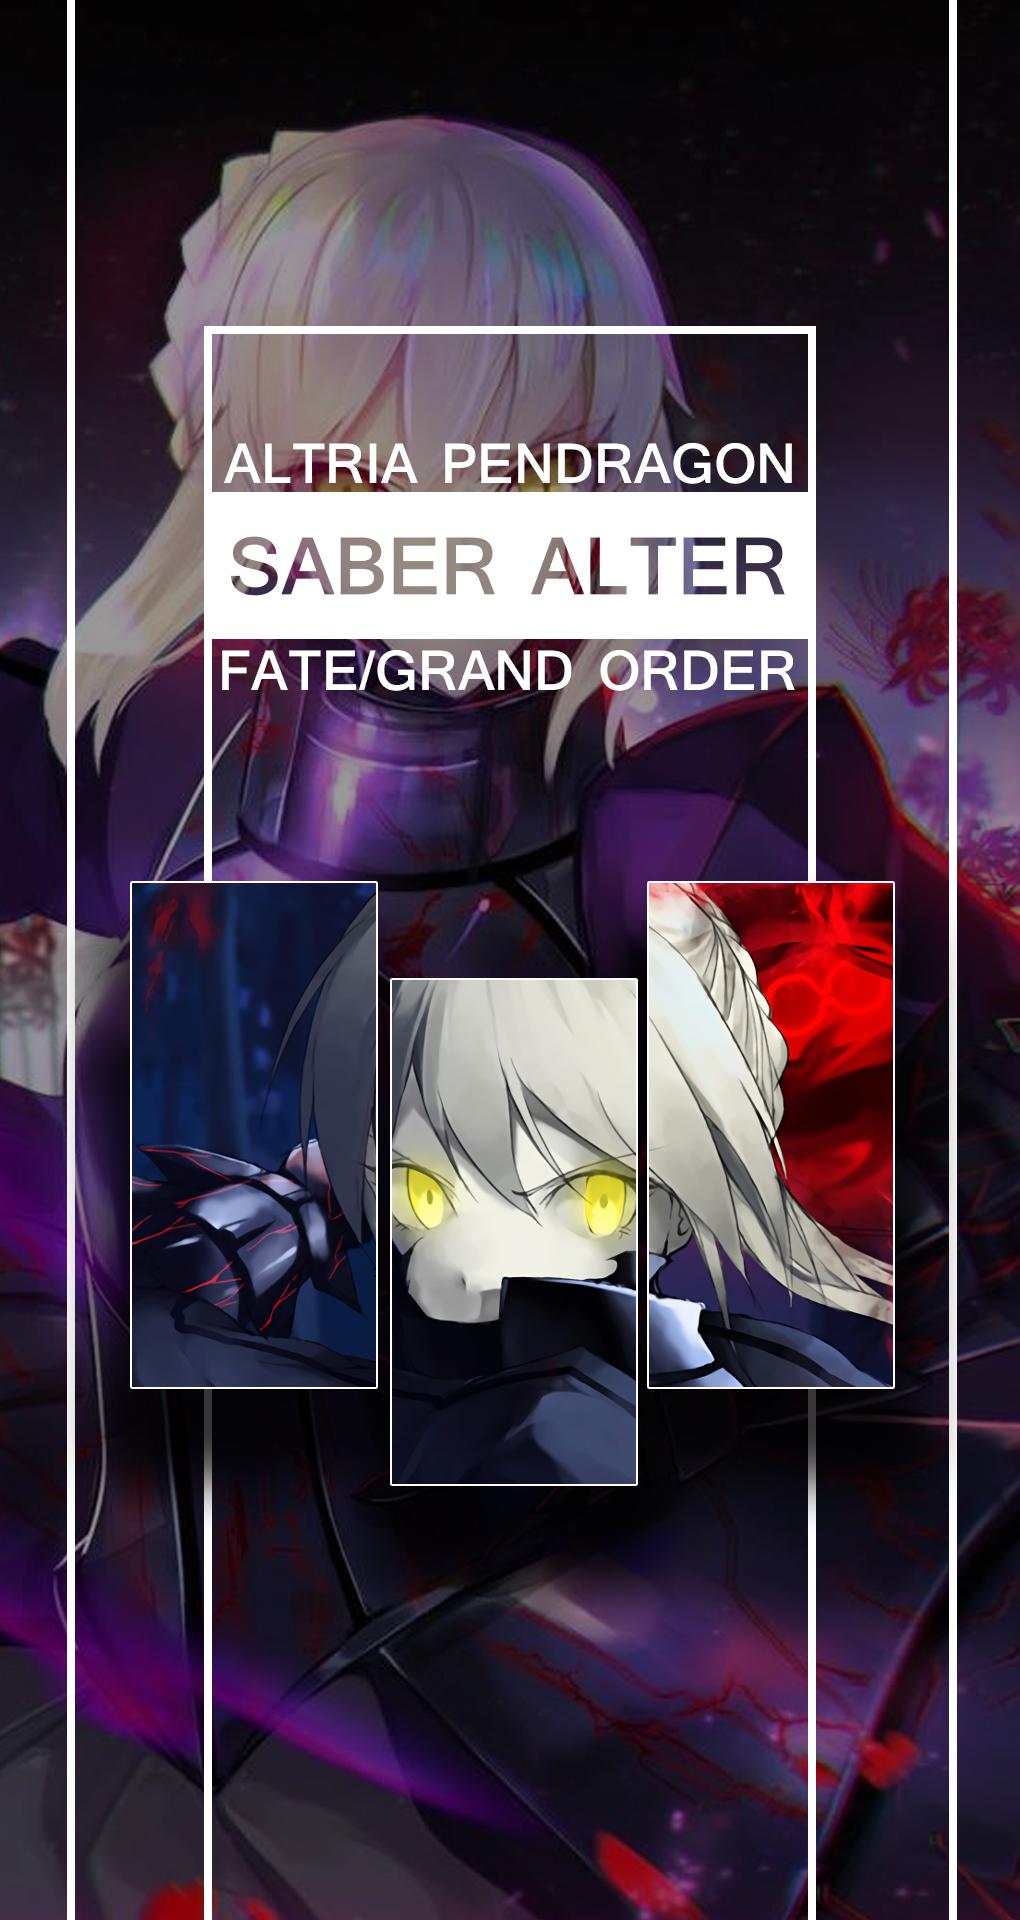 Fate Grand Order Mobile Wallpaper Saber Alter By Kurome0 On Deviantart